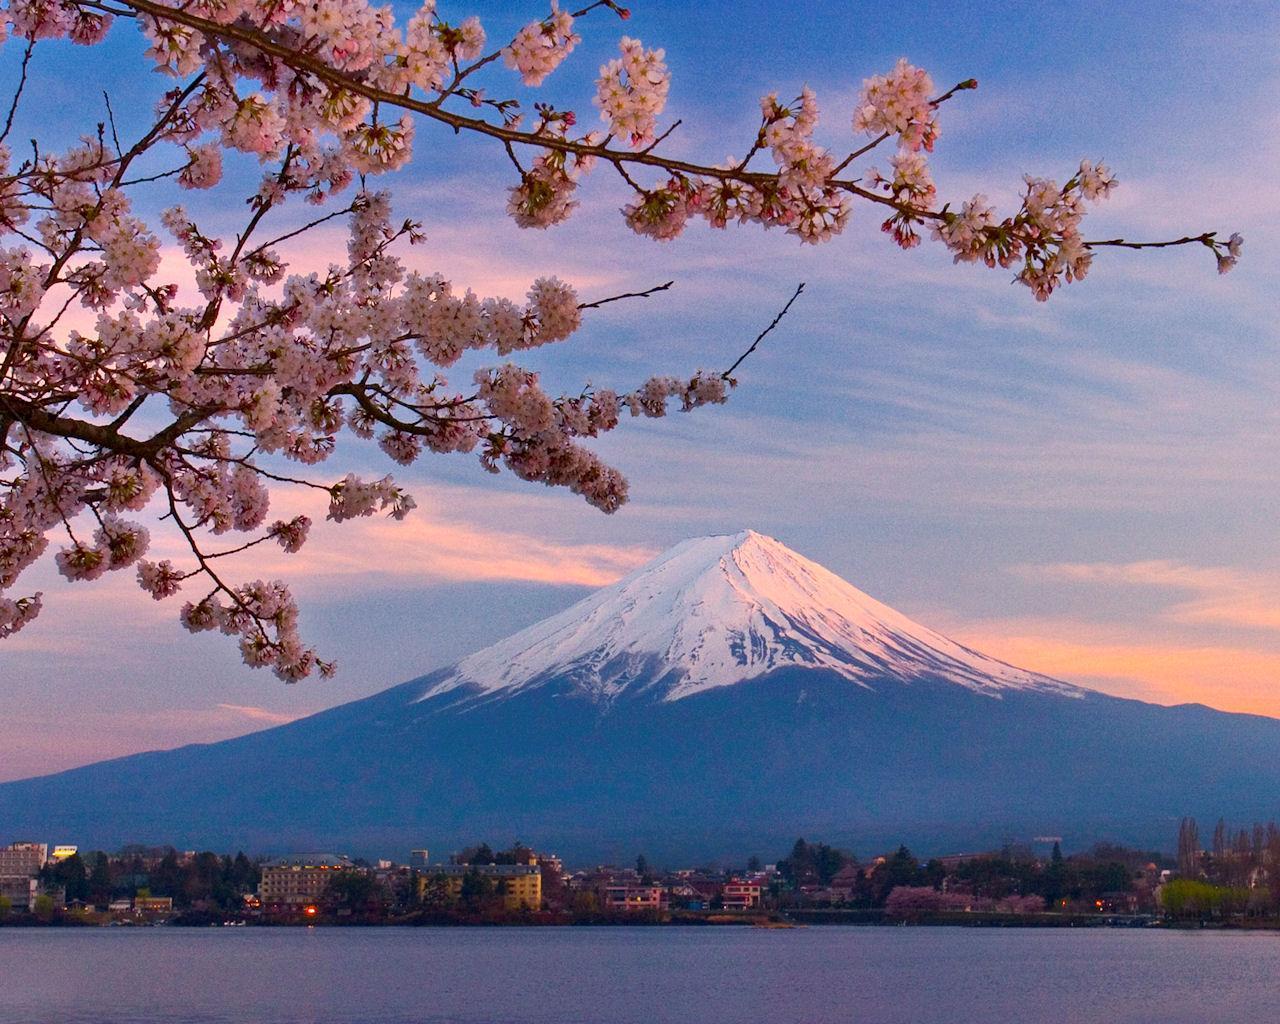 Mount Fuji Wallpapers.